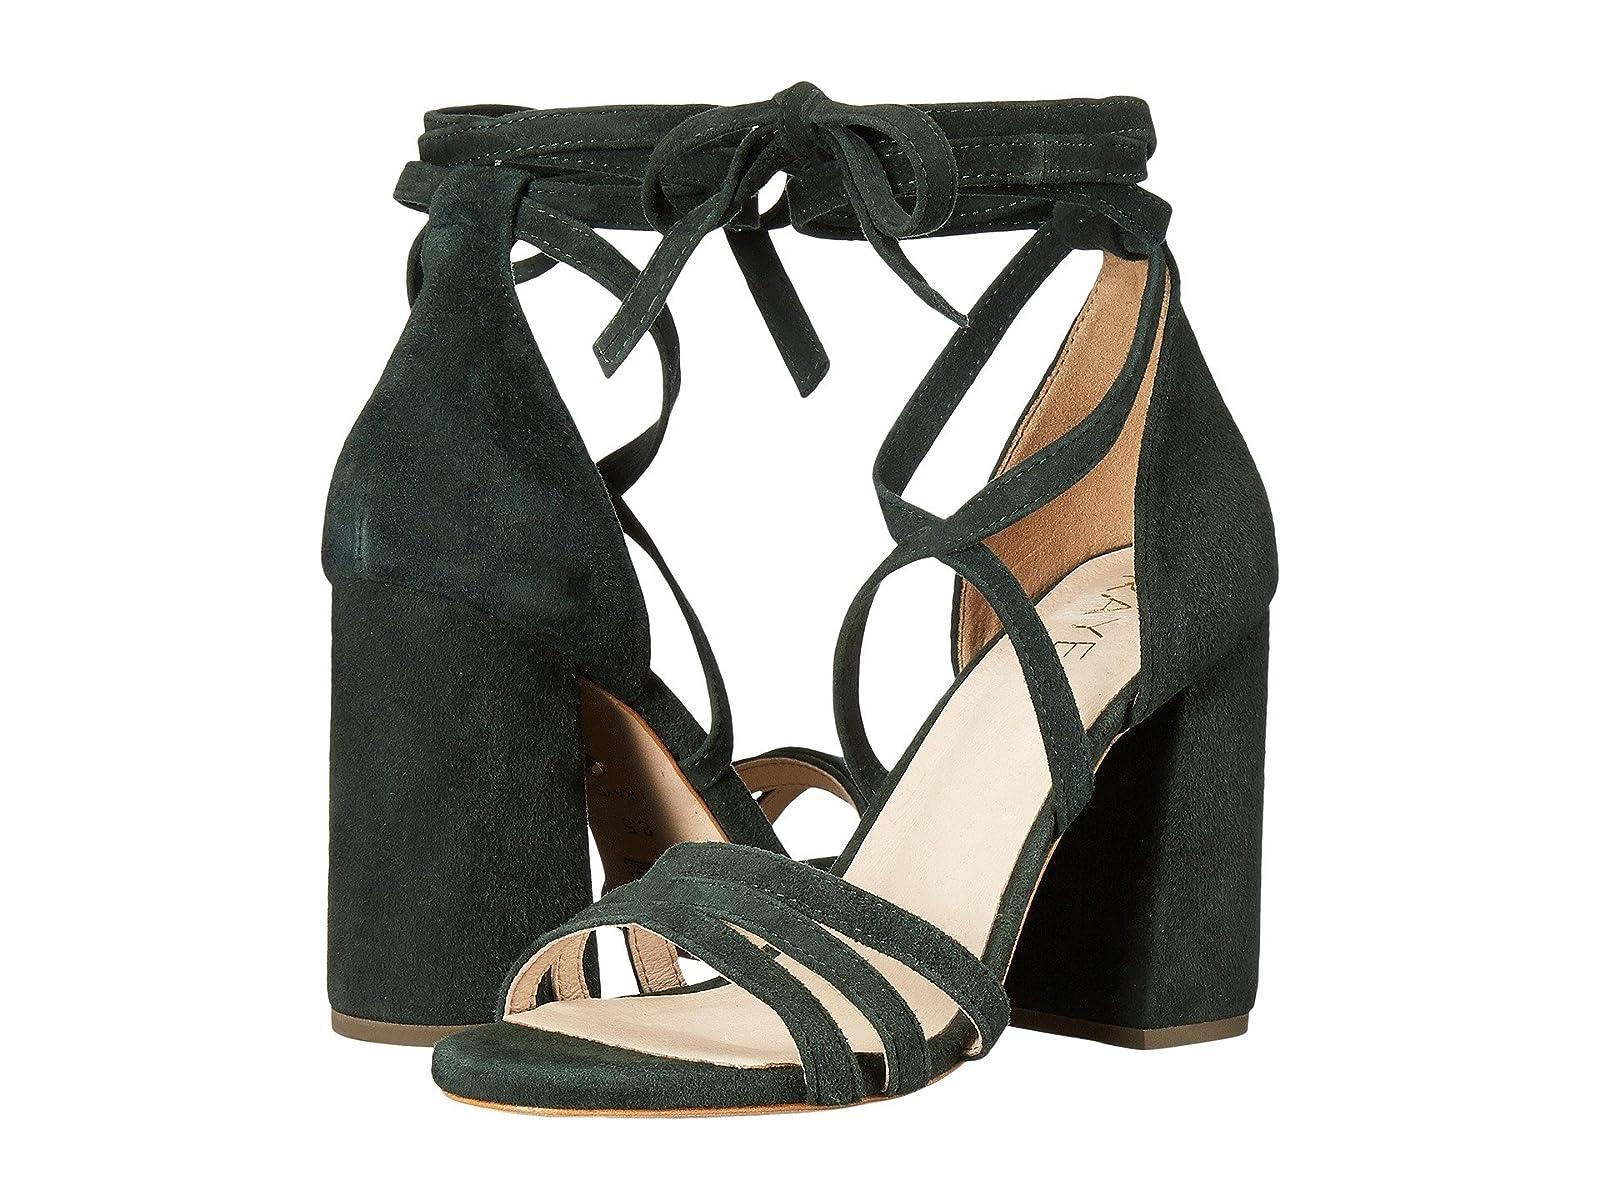 RAYE BirdieCheap and distinctive eye-catching shoes